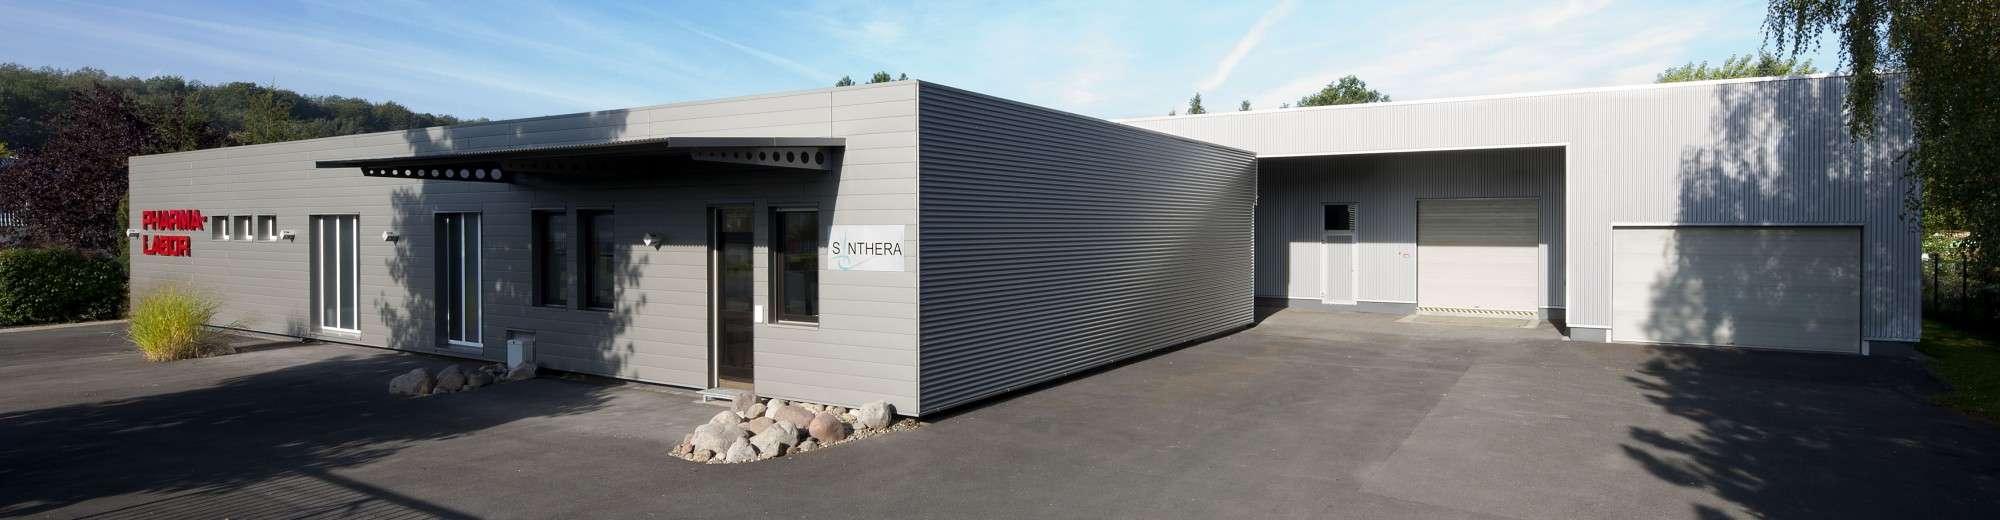 SYNTHERA Dr. Friedrichs GmbH & Co.KG